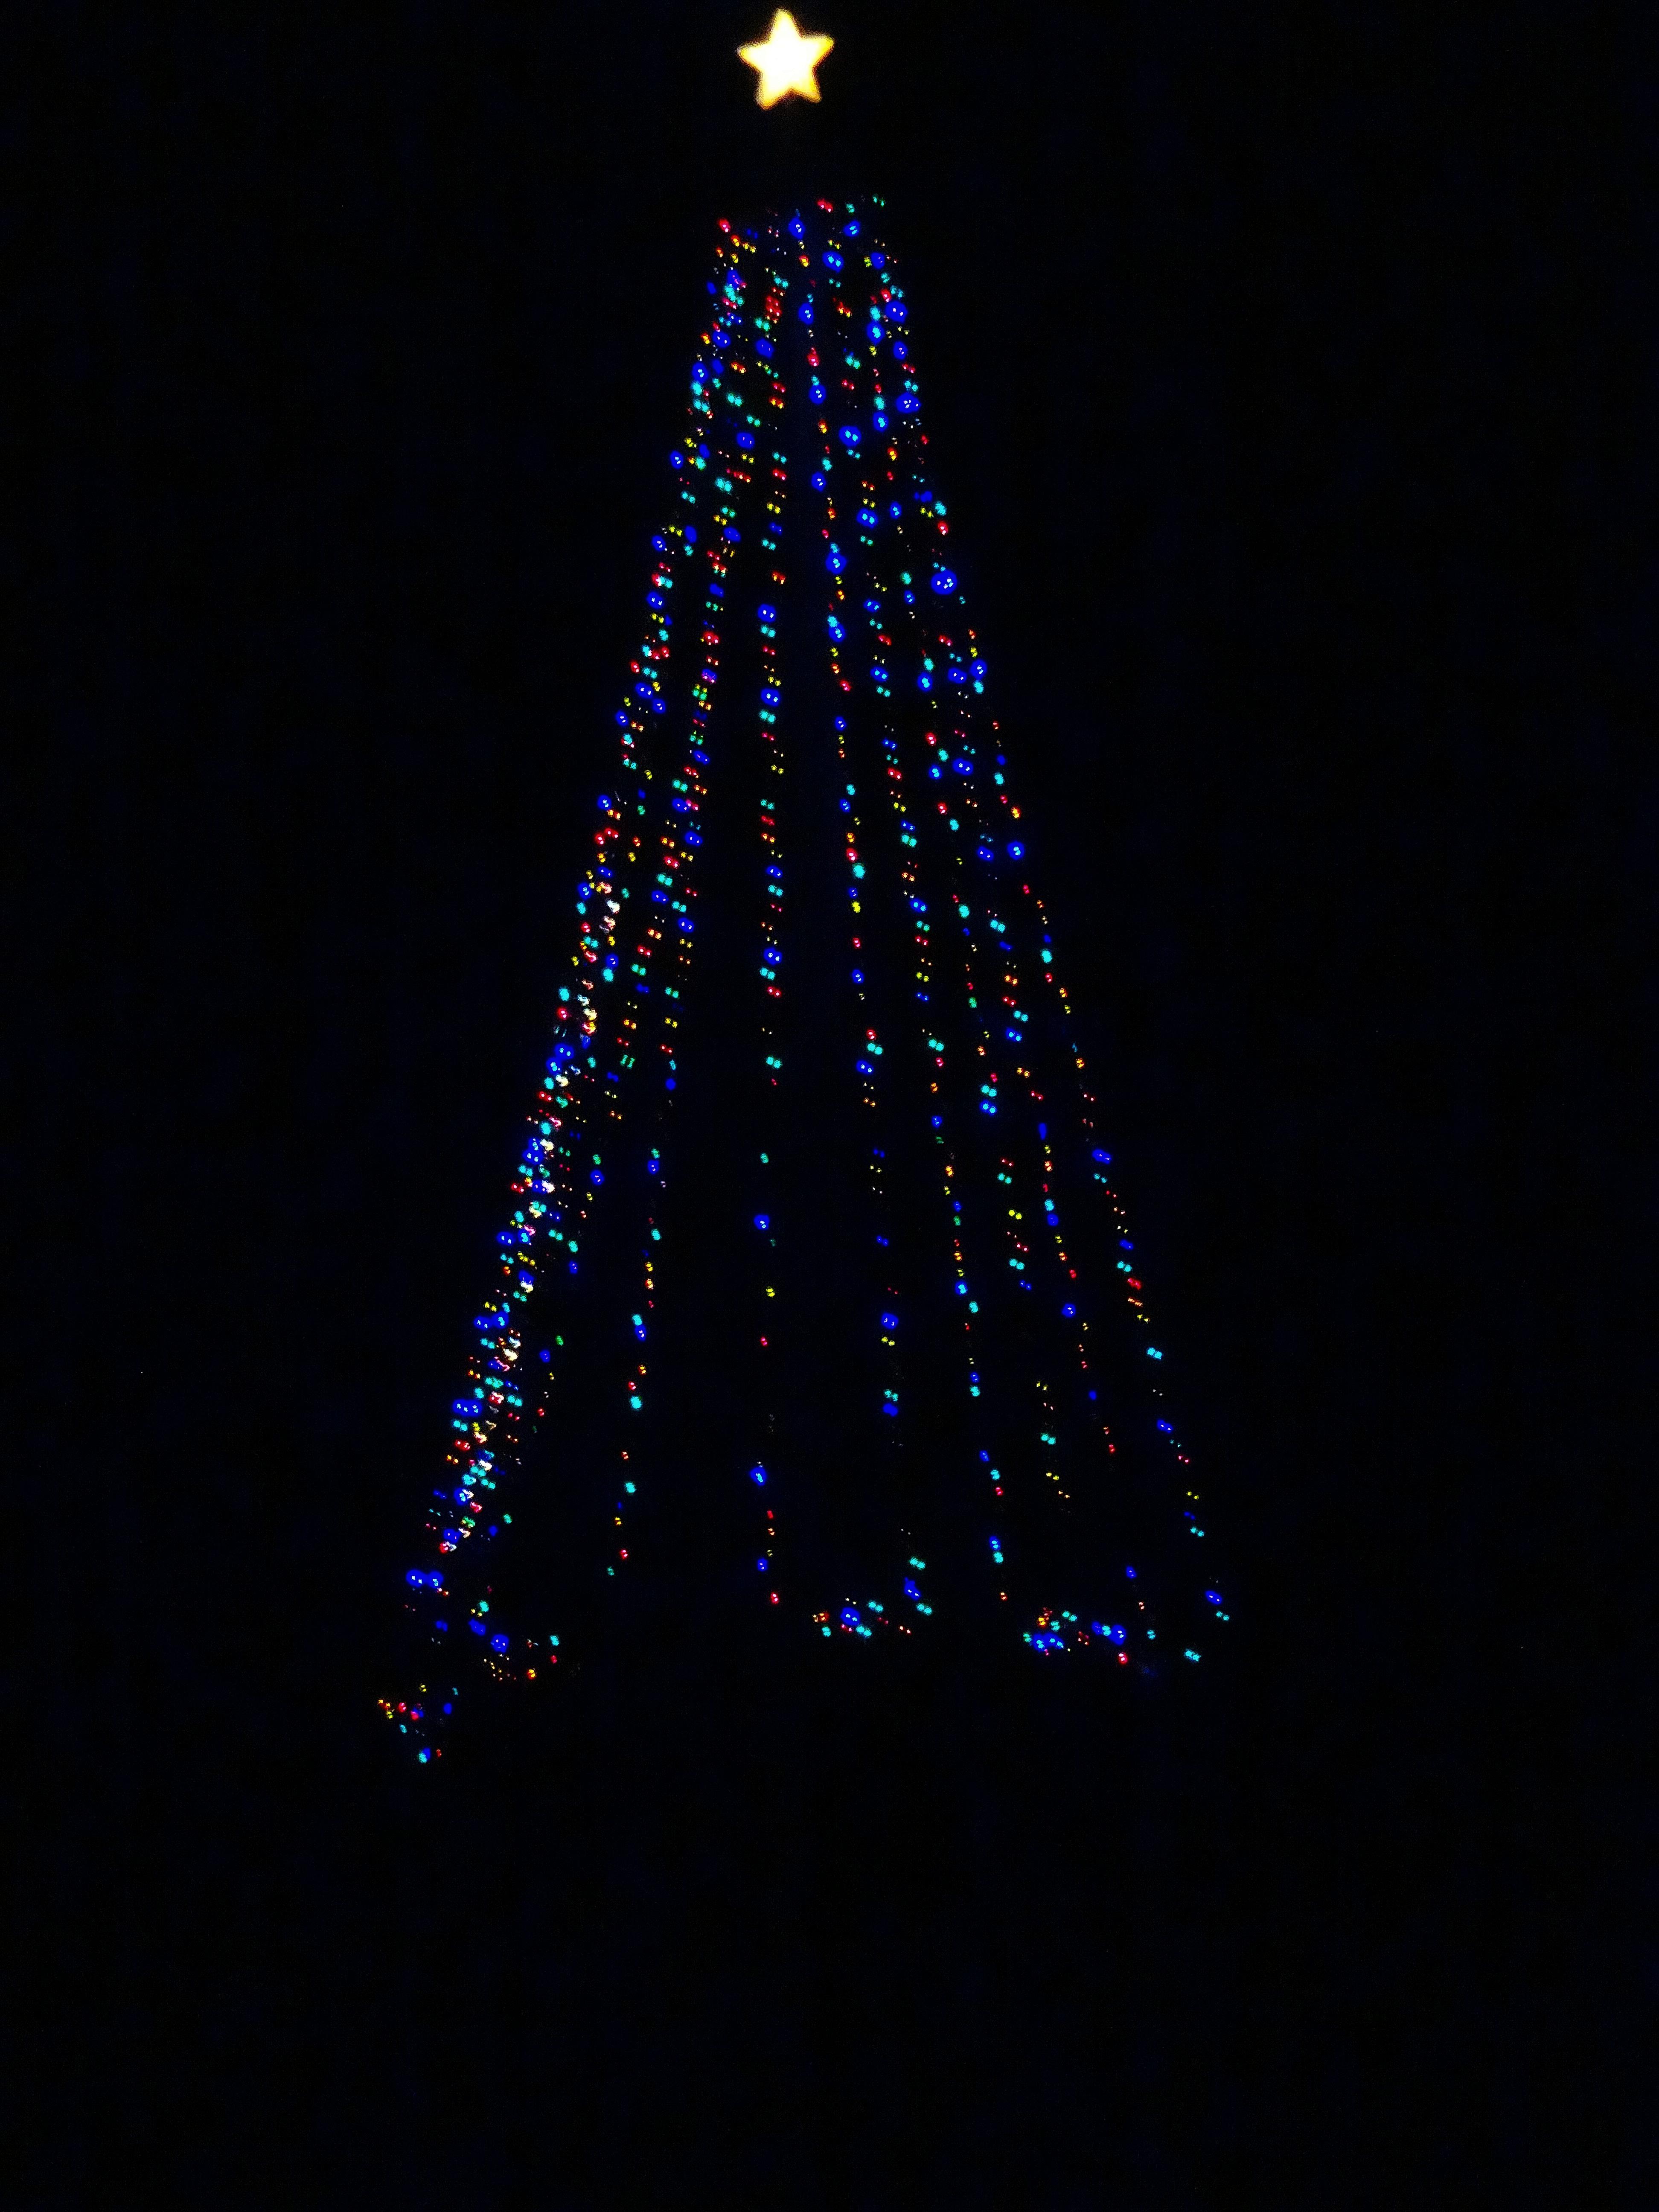 filecross plains hilltop christmas tree panoramio 3jpg - Hilltop Christmas